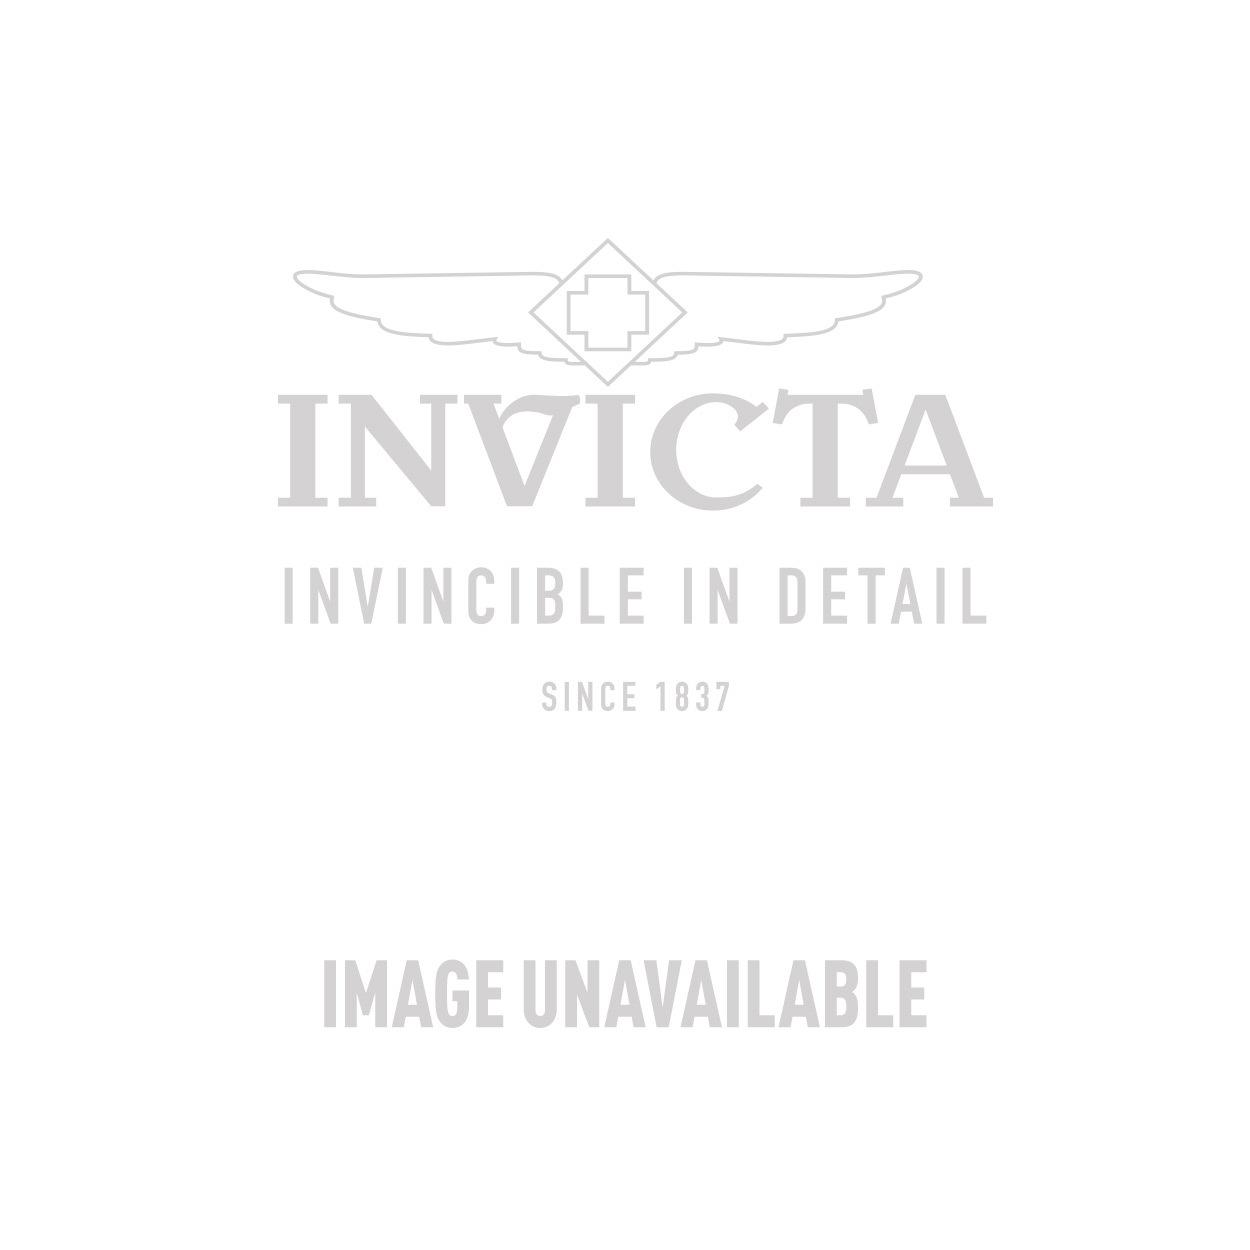 aa60ec43c Invicta Specialty Ladies Quartz 36 mm Gold Case Gold Dial - Model 27001